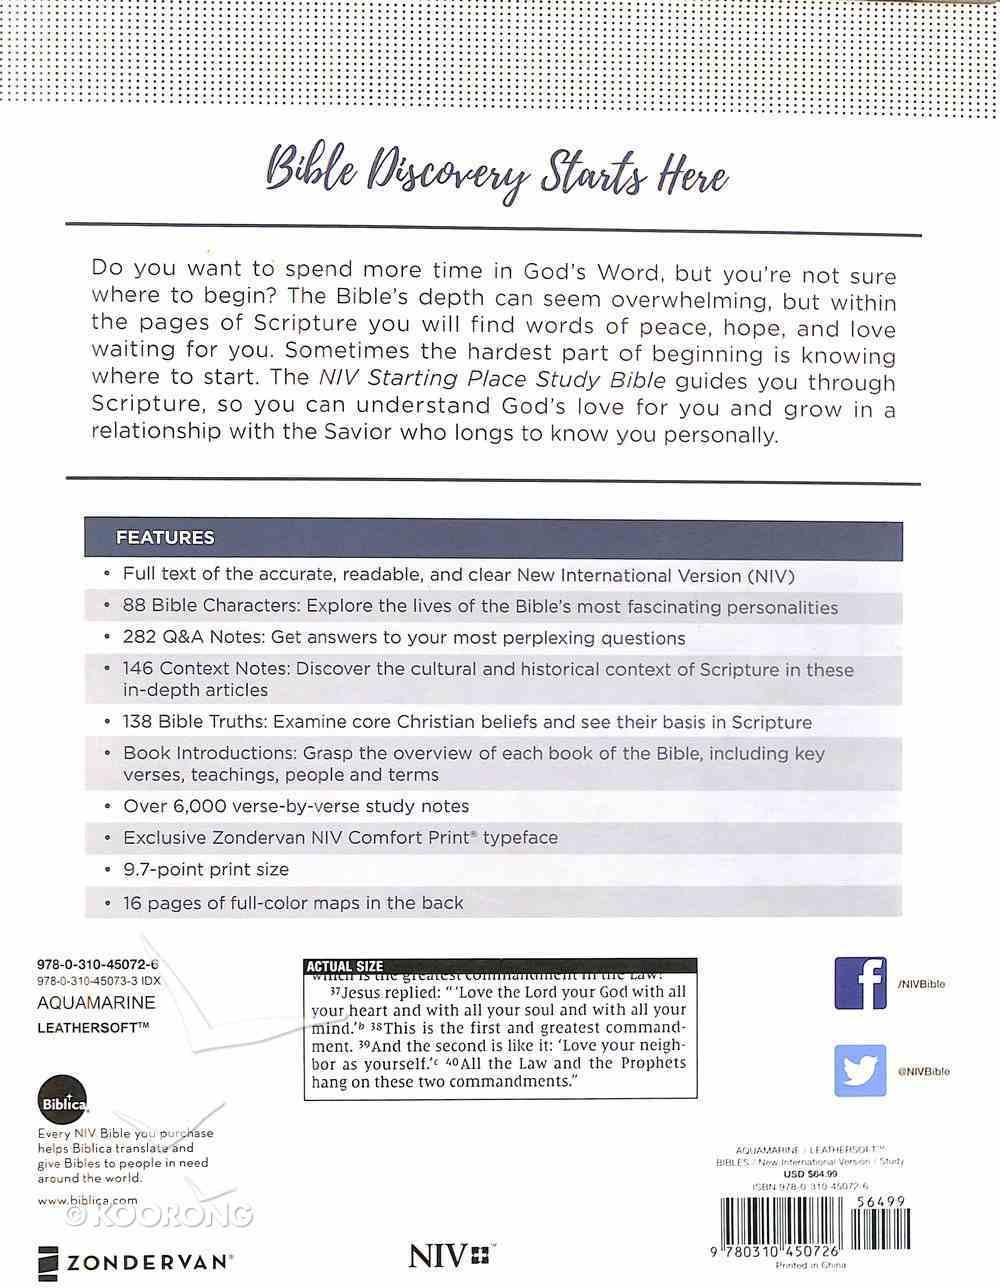 NIV Starting Place Study Bible Blue Premium Imitation Leather